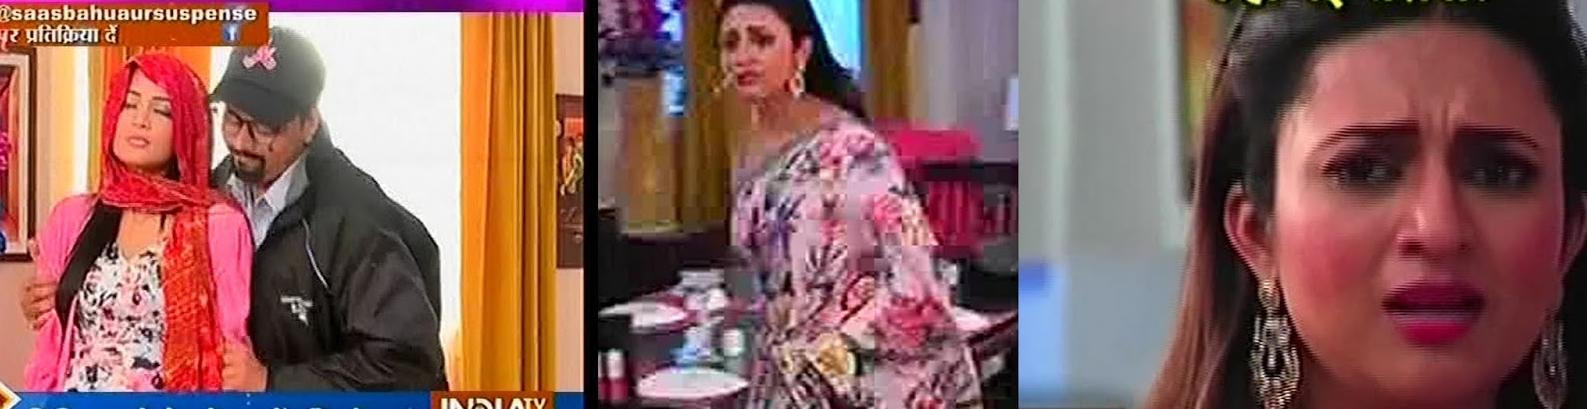 Yeh Hai Mohabbatein:Raman-Ishita get hand on Param post eyeing CCTV footage of Roshni